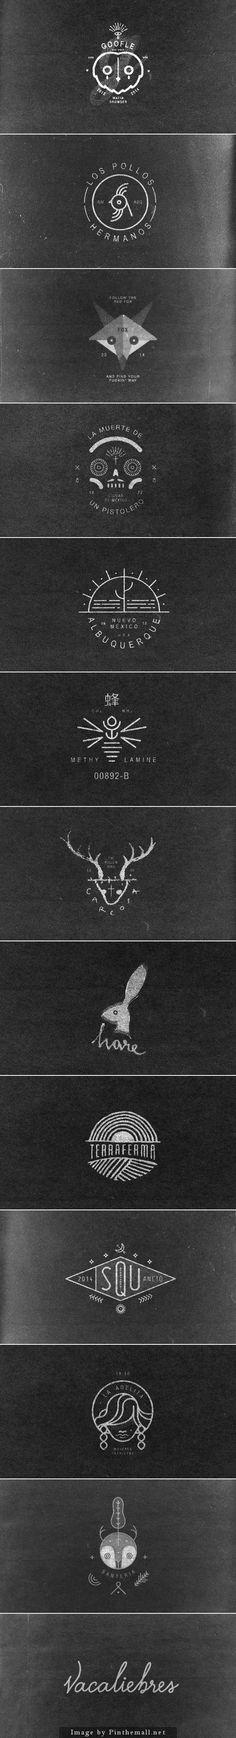 Logos by vacaliebres